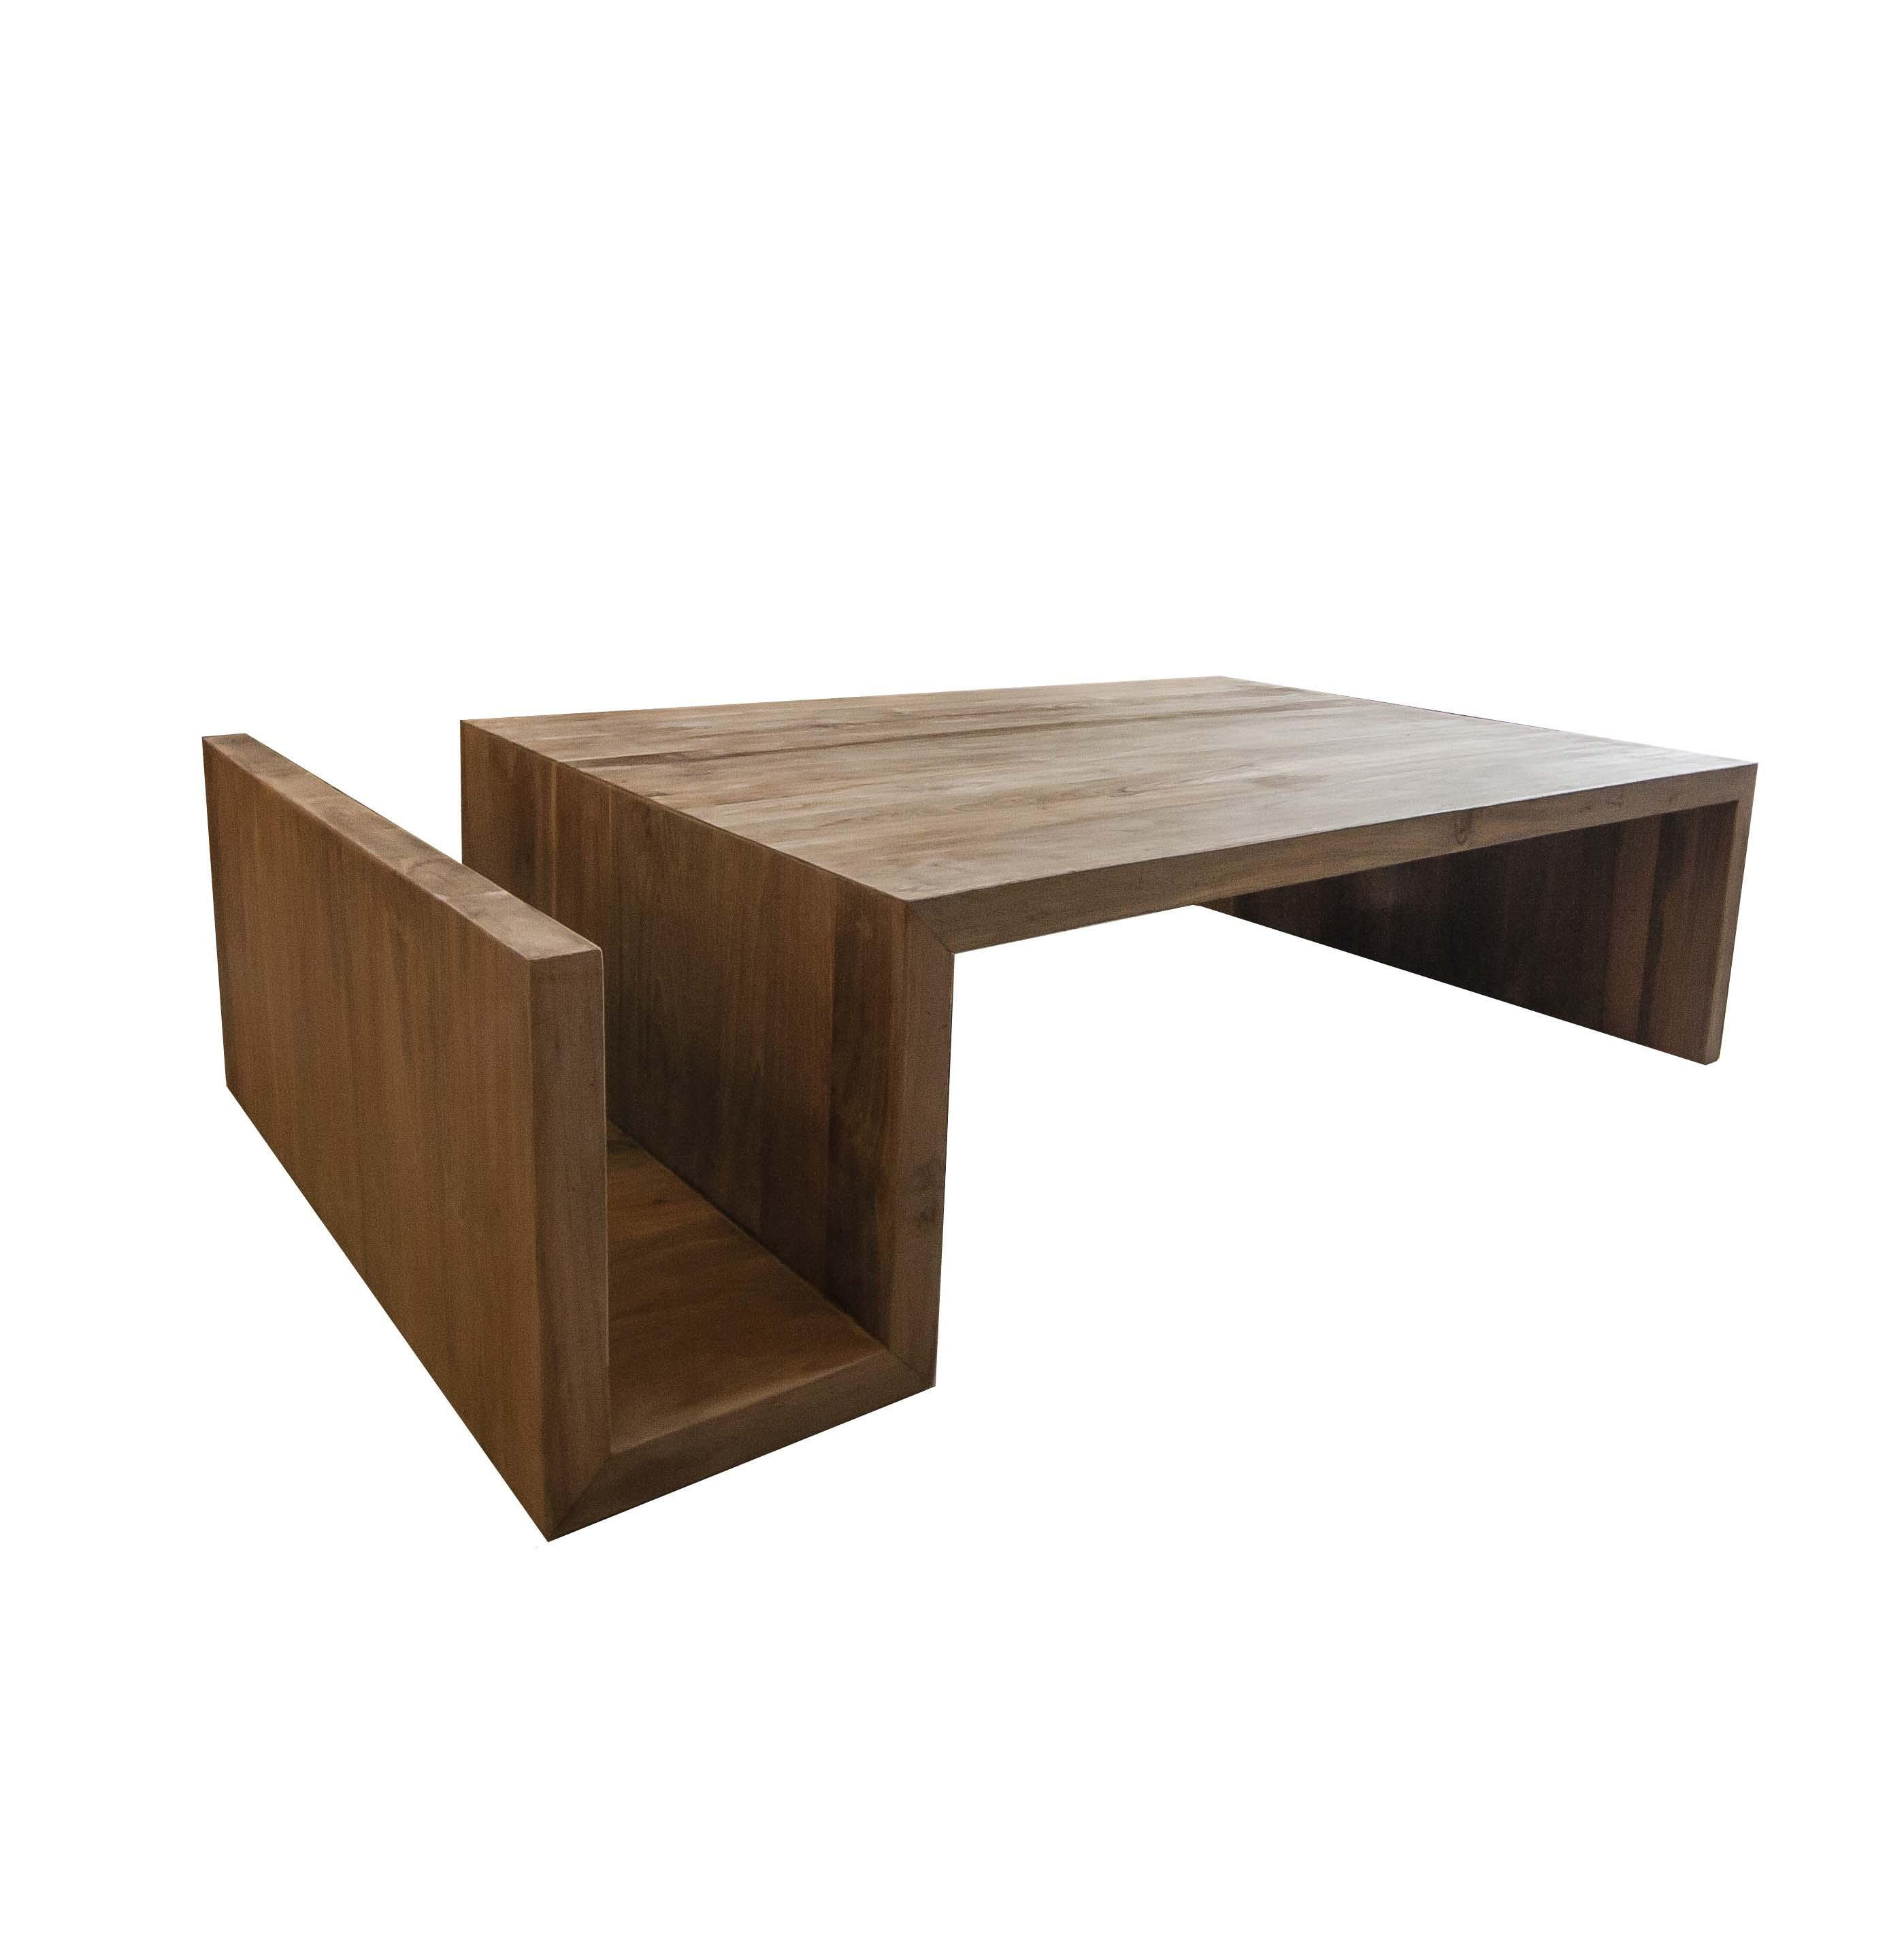 Kutamara Reclaimed Wood Coffee Table1